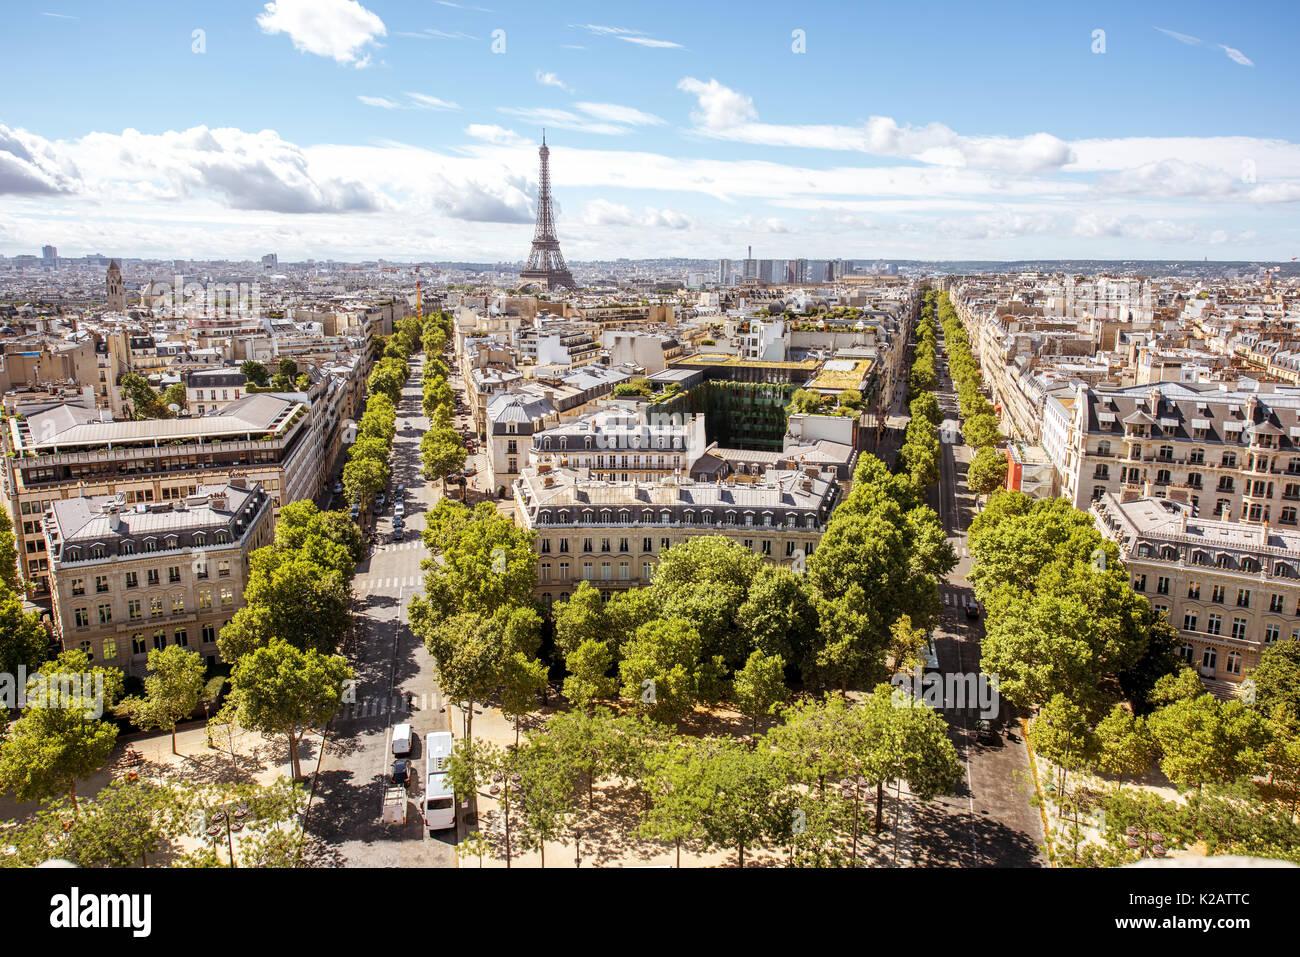 Cityscape view of Paris - Stock Image